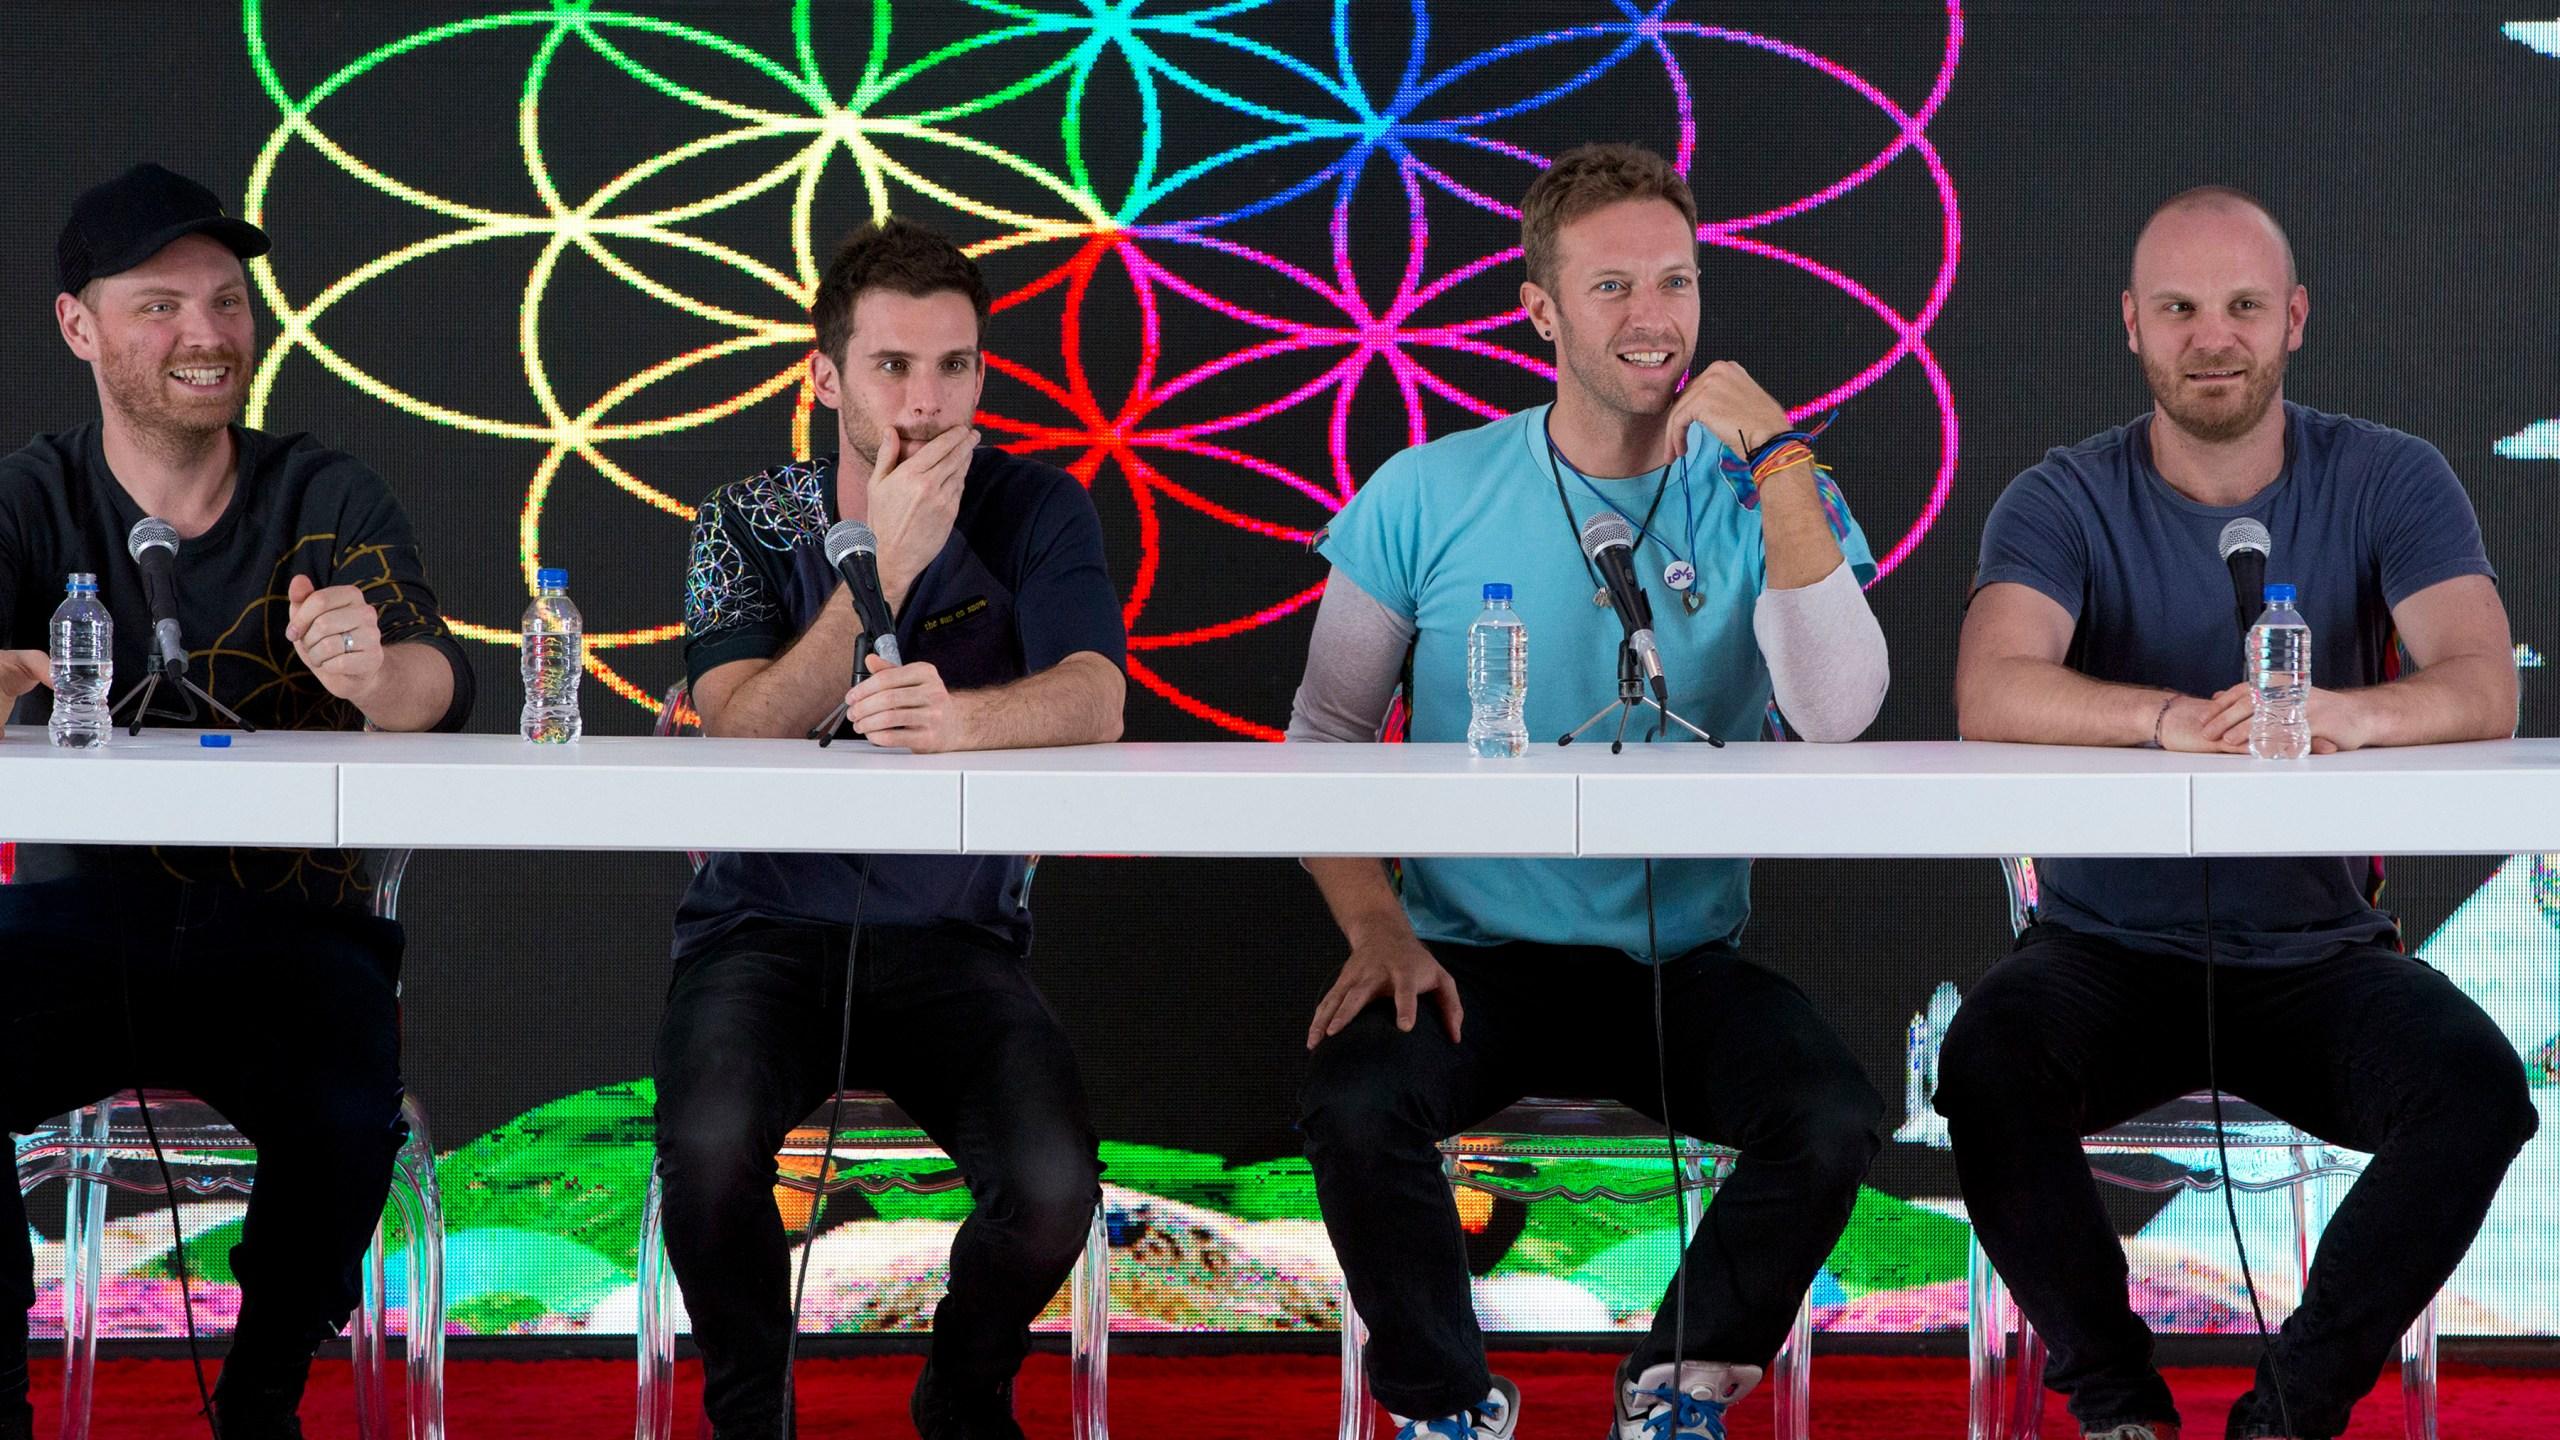 Jonny Buckland, Guy Berryman, Chris Martin, Will Champion